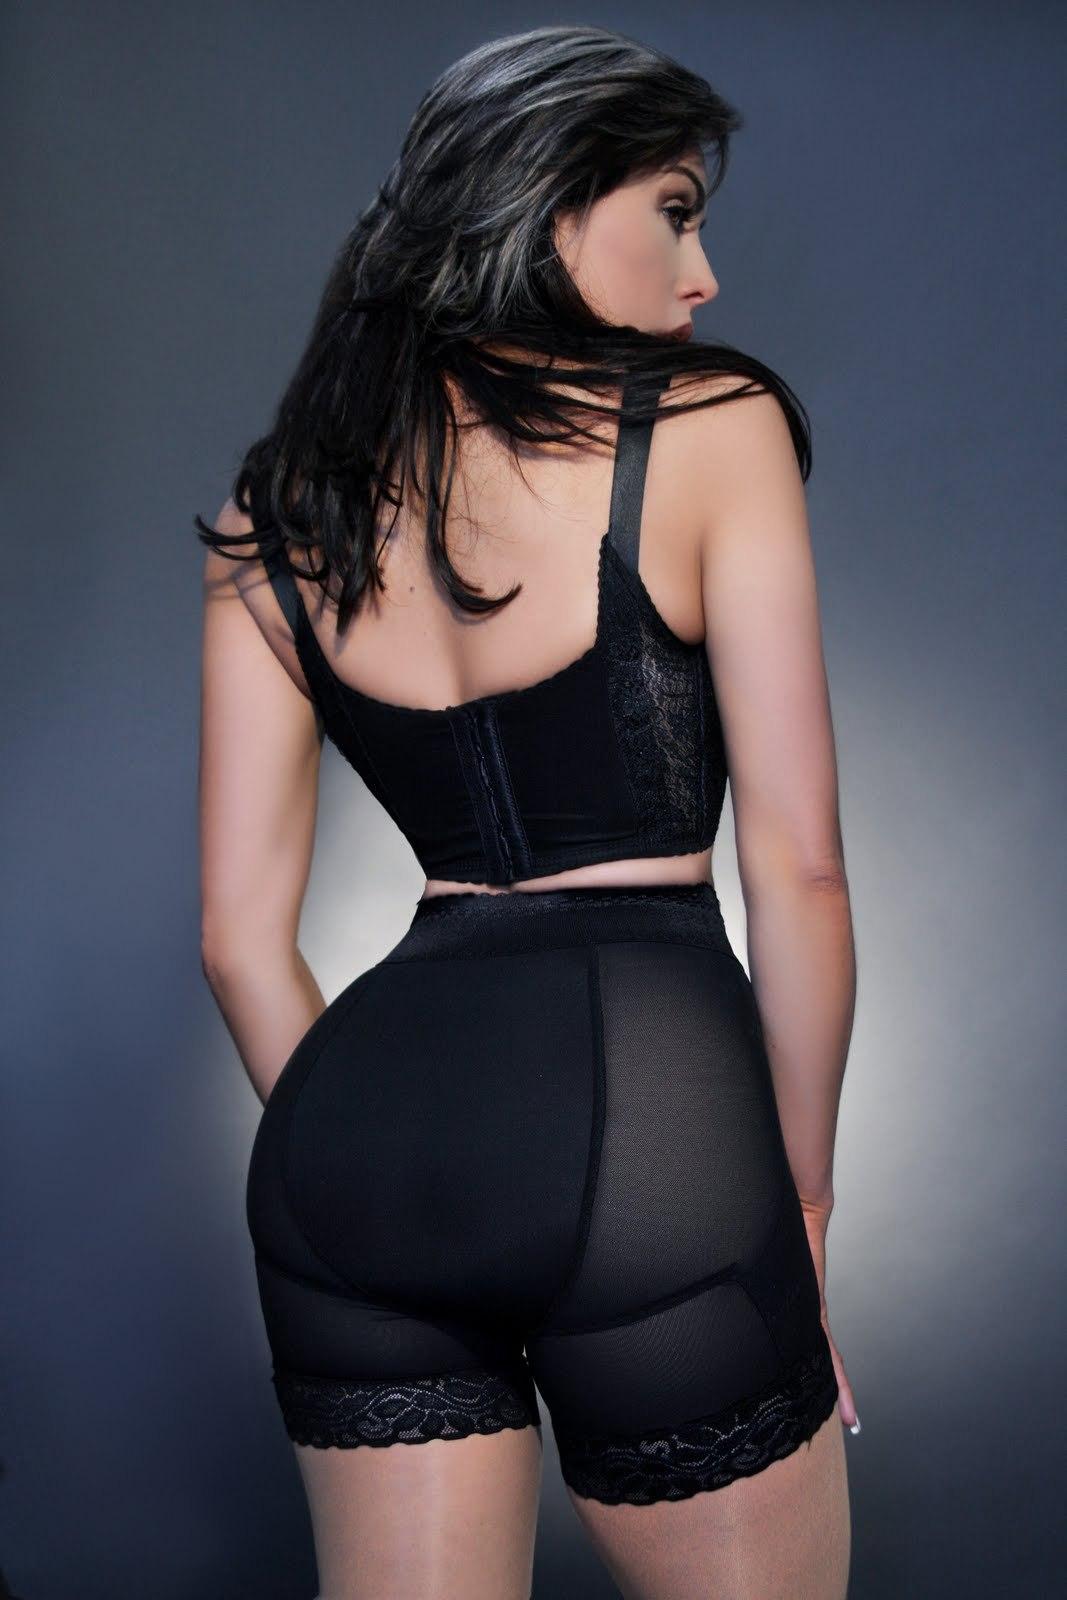 sexy little panties tumblr